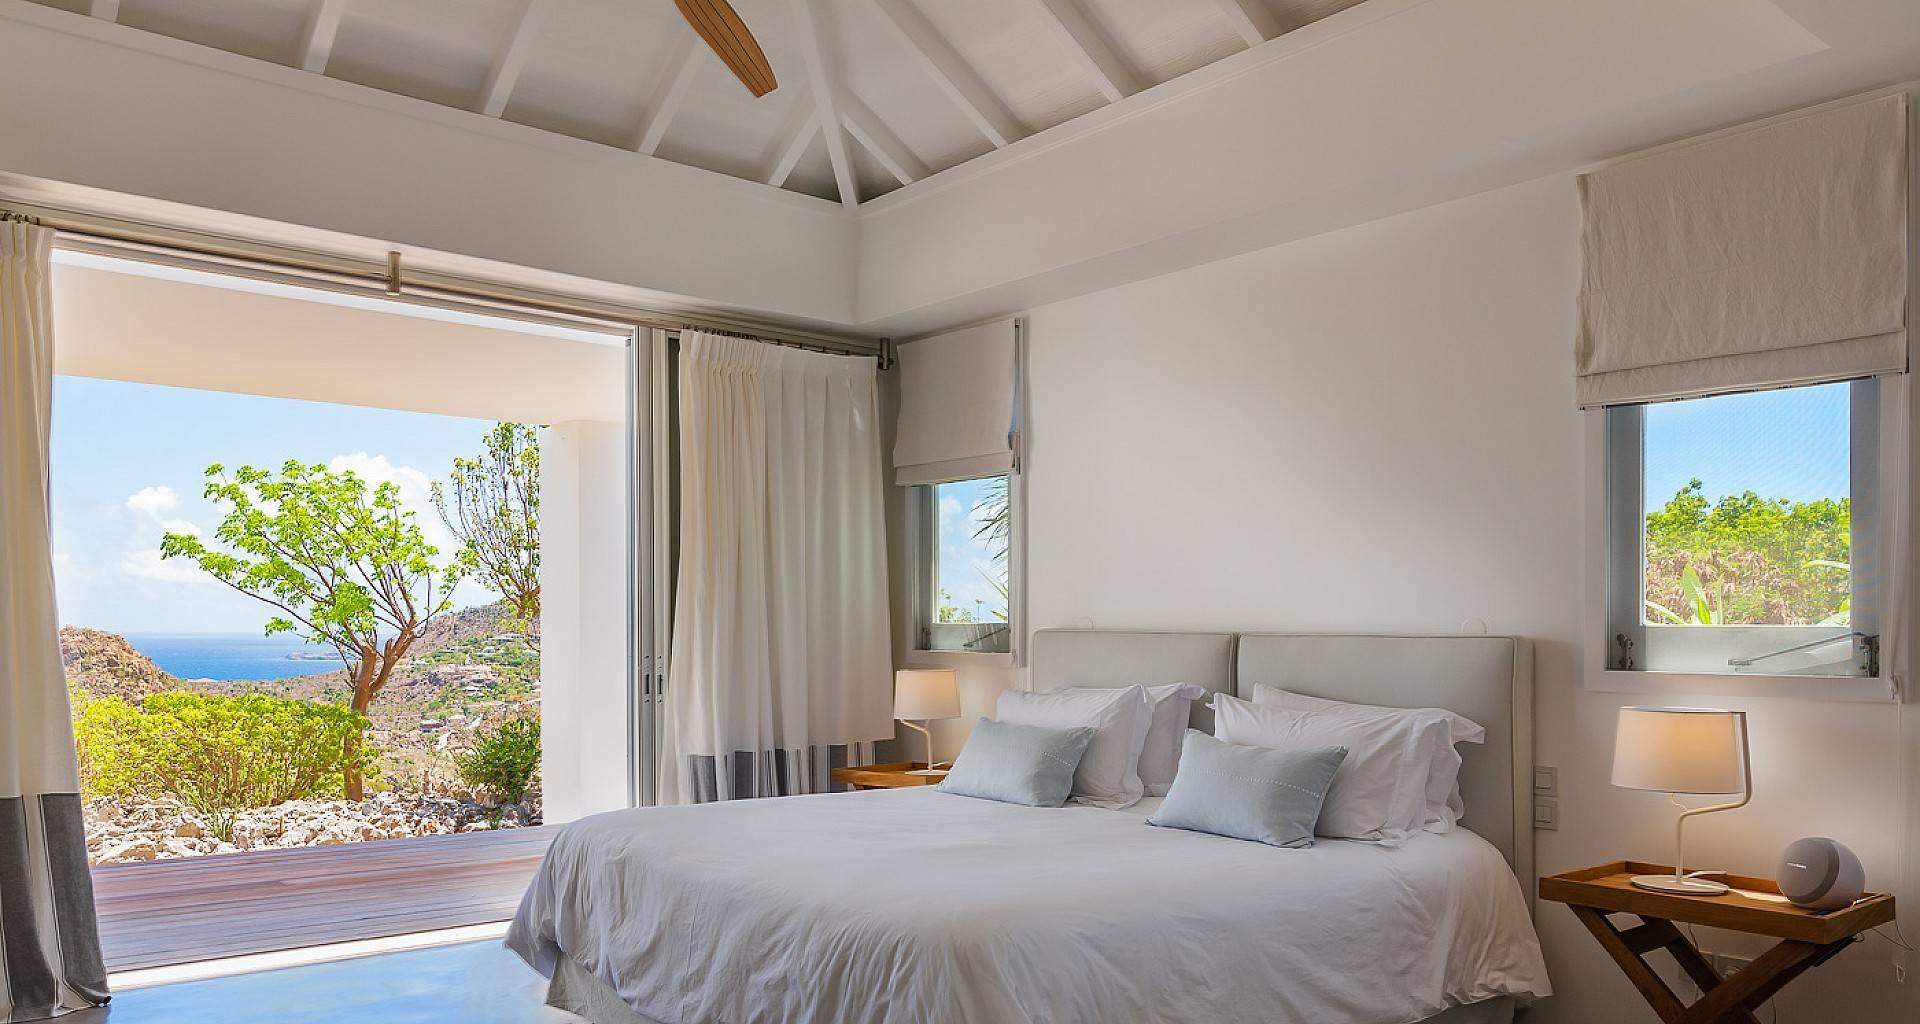 Villa Olive Bedroom 1